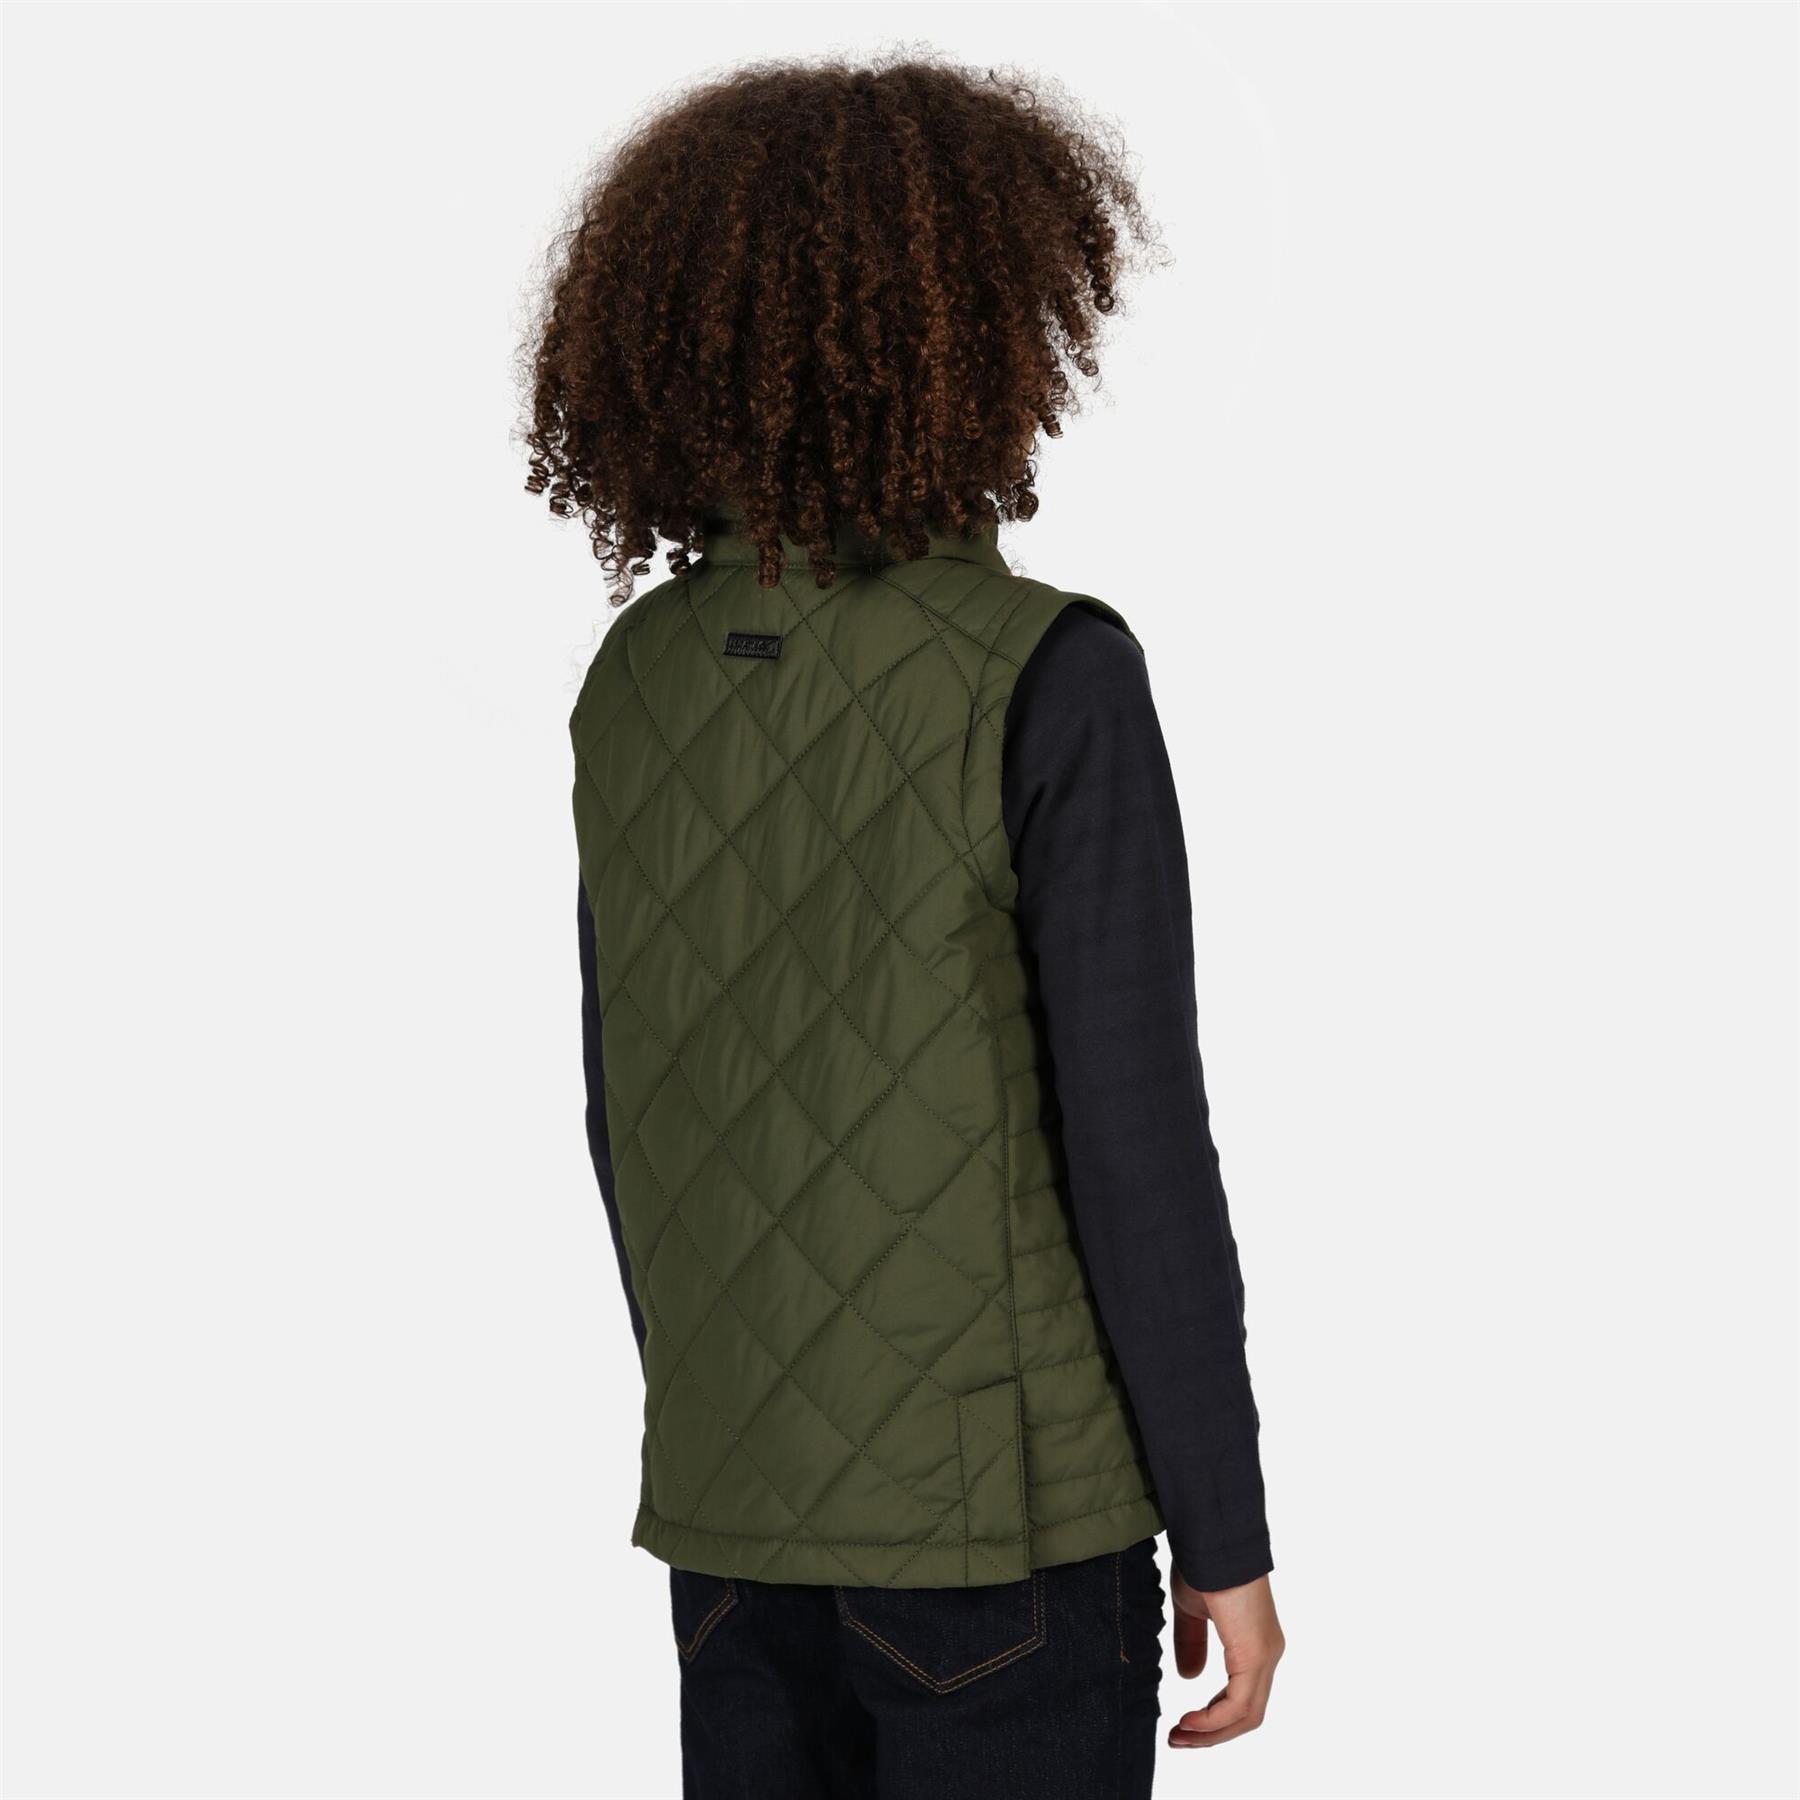 miniatuur 4 - Regatta Kids Zion Quilted Insulated Bodywarmer Gilet Zip Pockets